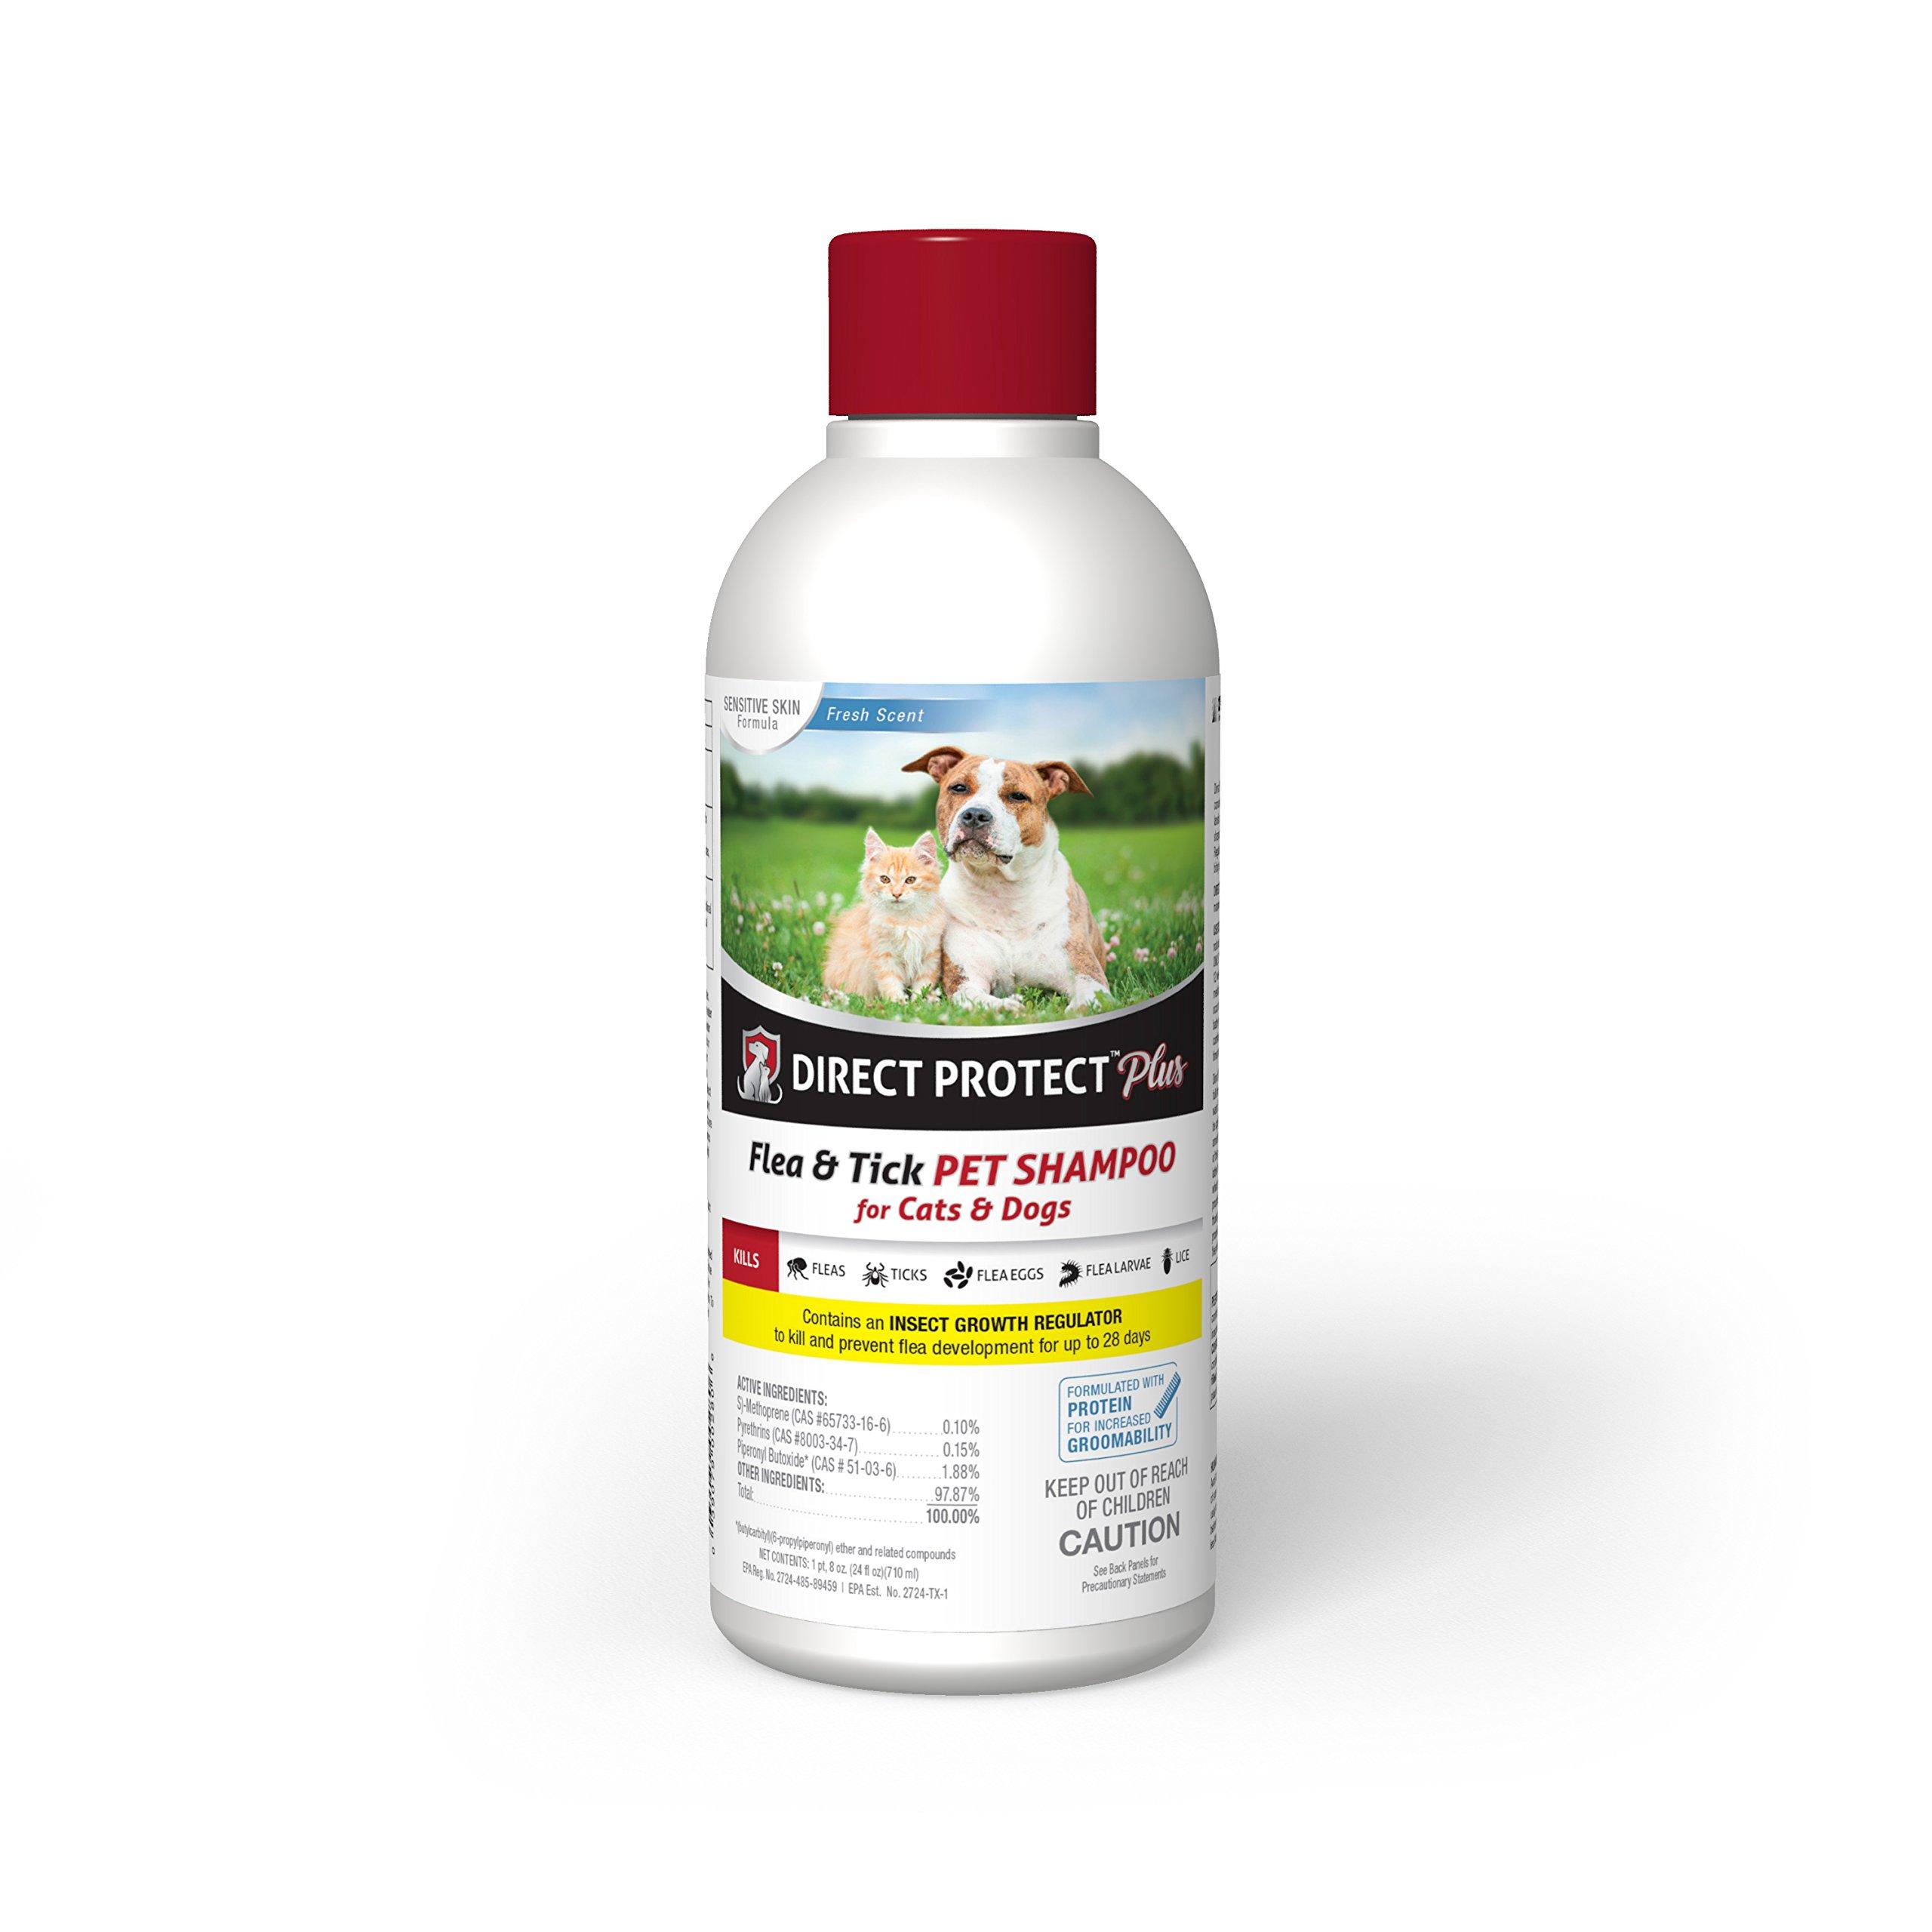 Direct Protect Plus Flea & Tick Shampoo Cats & Dogs 24 oz